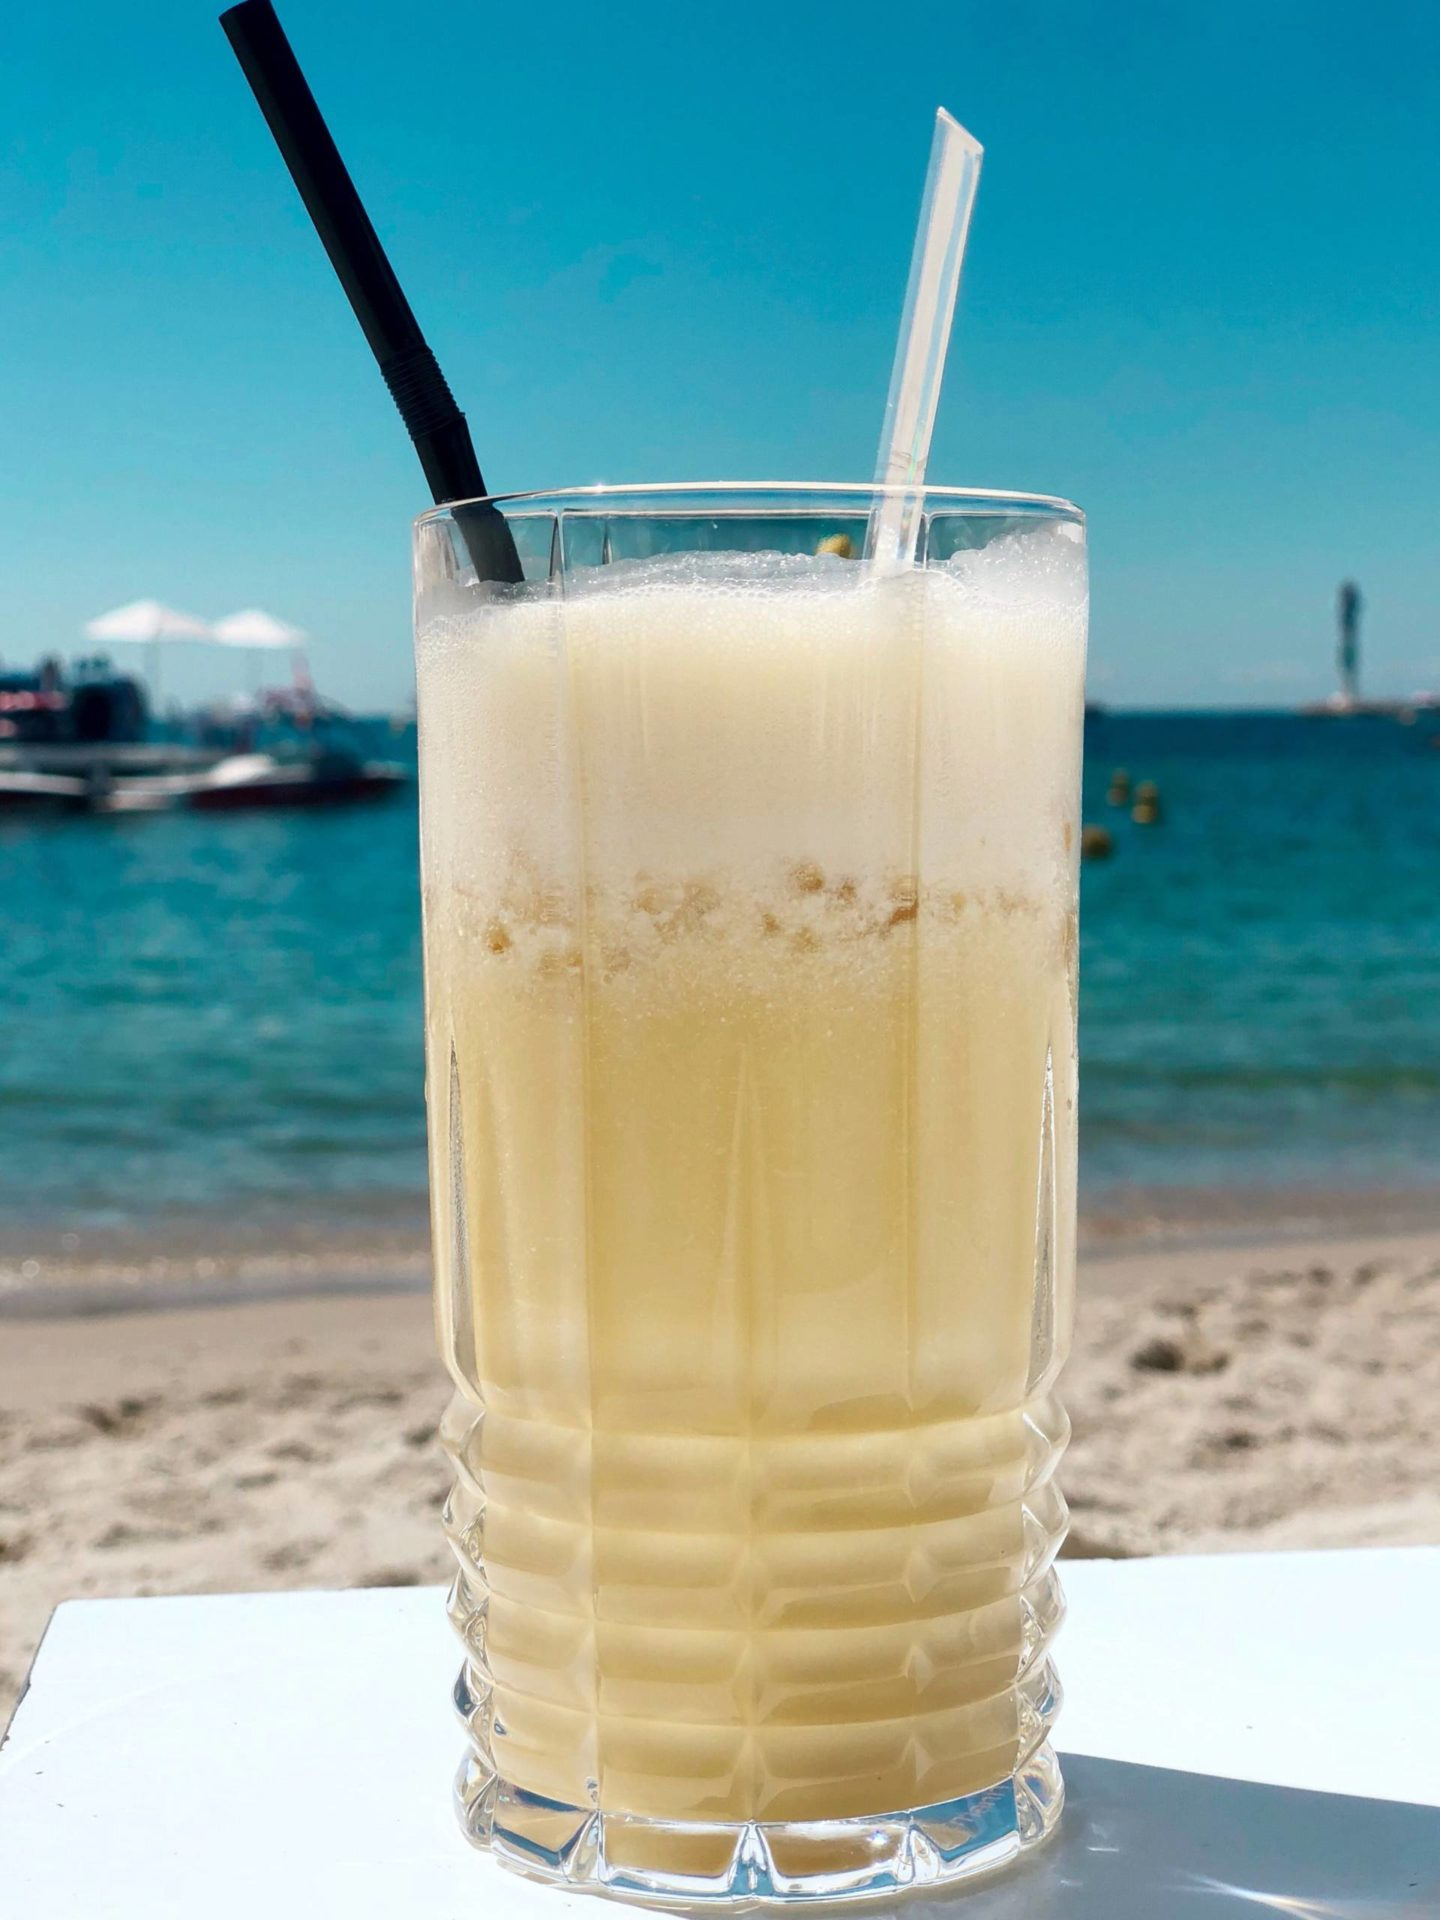 Le Fruit du jour : L'Ananas ! / Fruit of the day : Pineapple